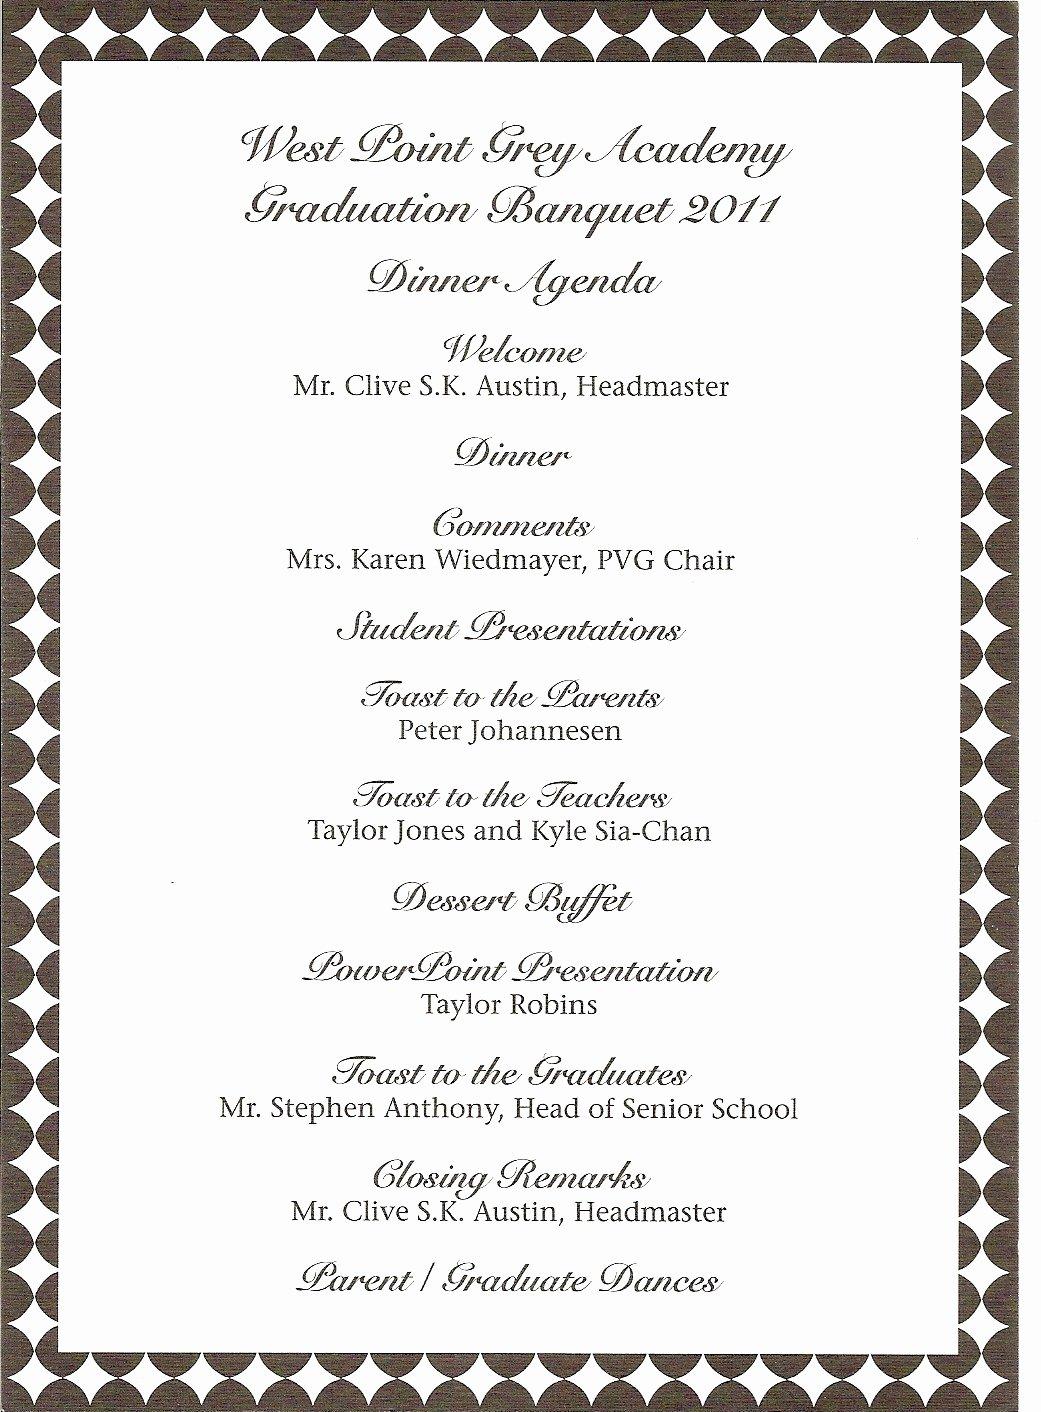 Church Banquet Program New Donna S Report Wpga Graduation Banquet Teddy